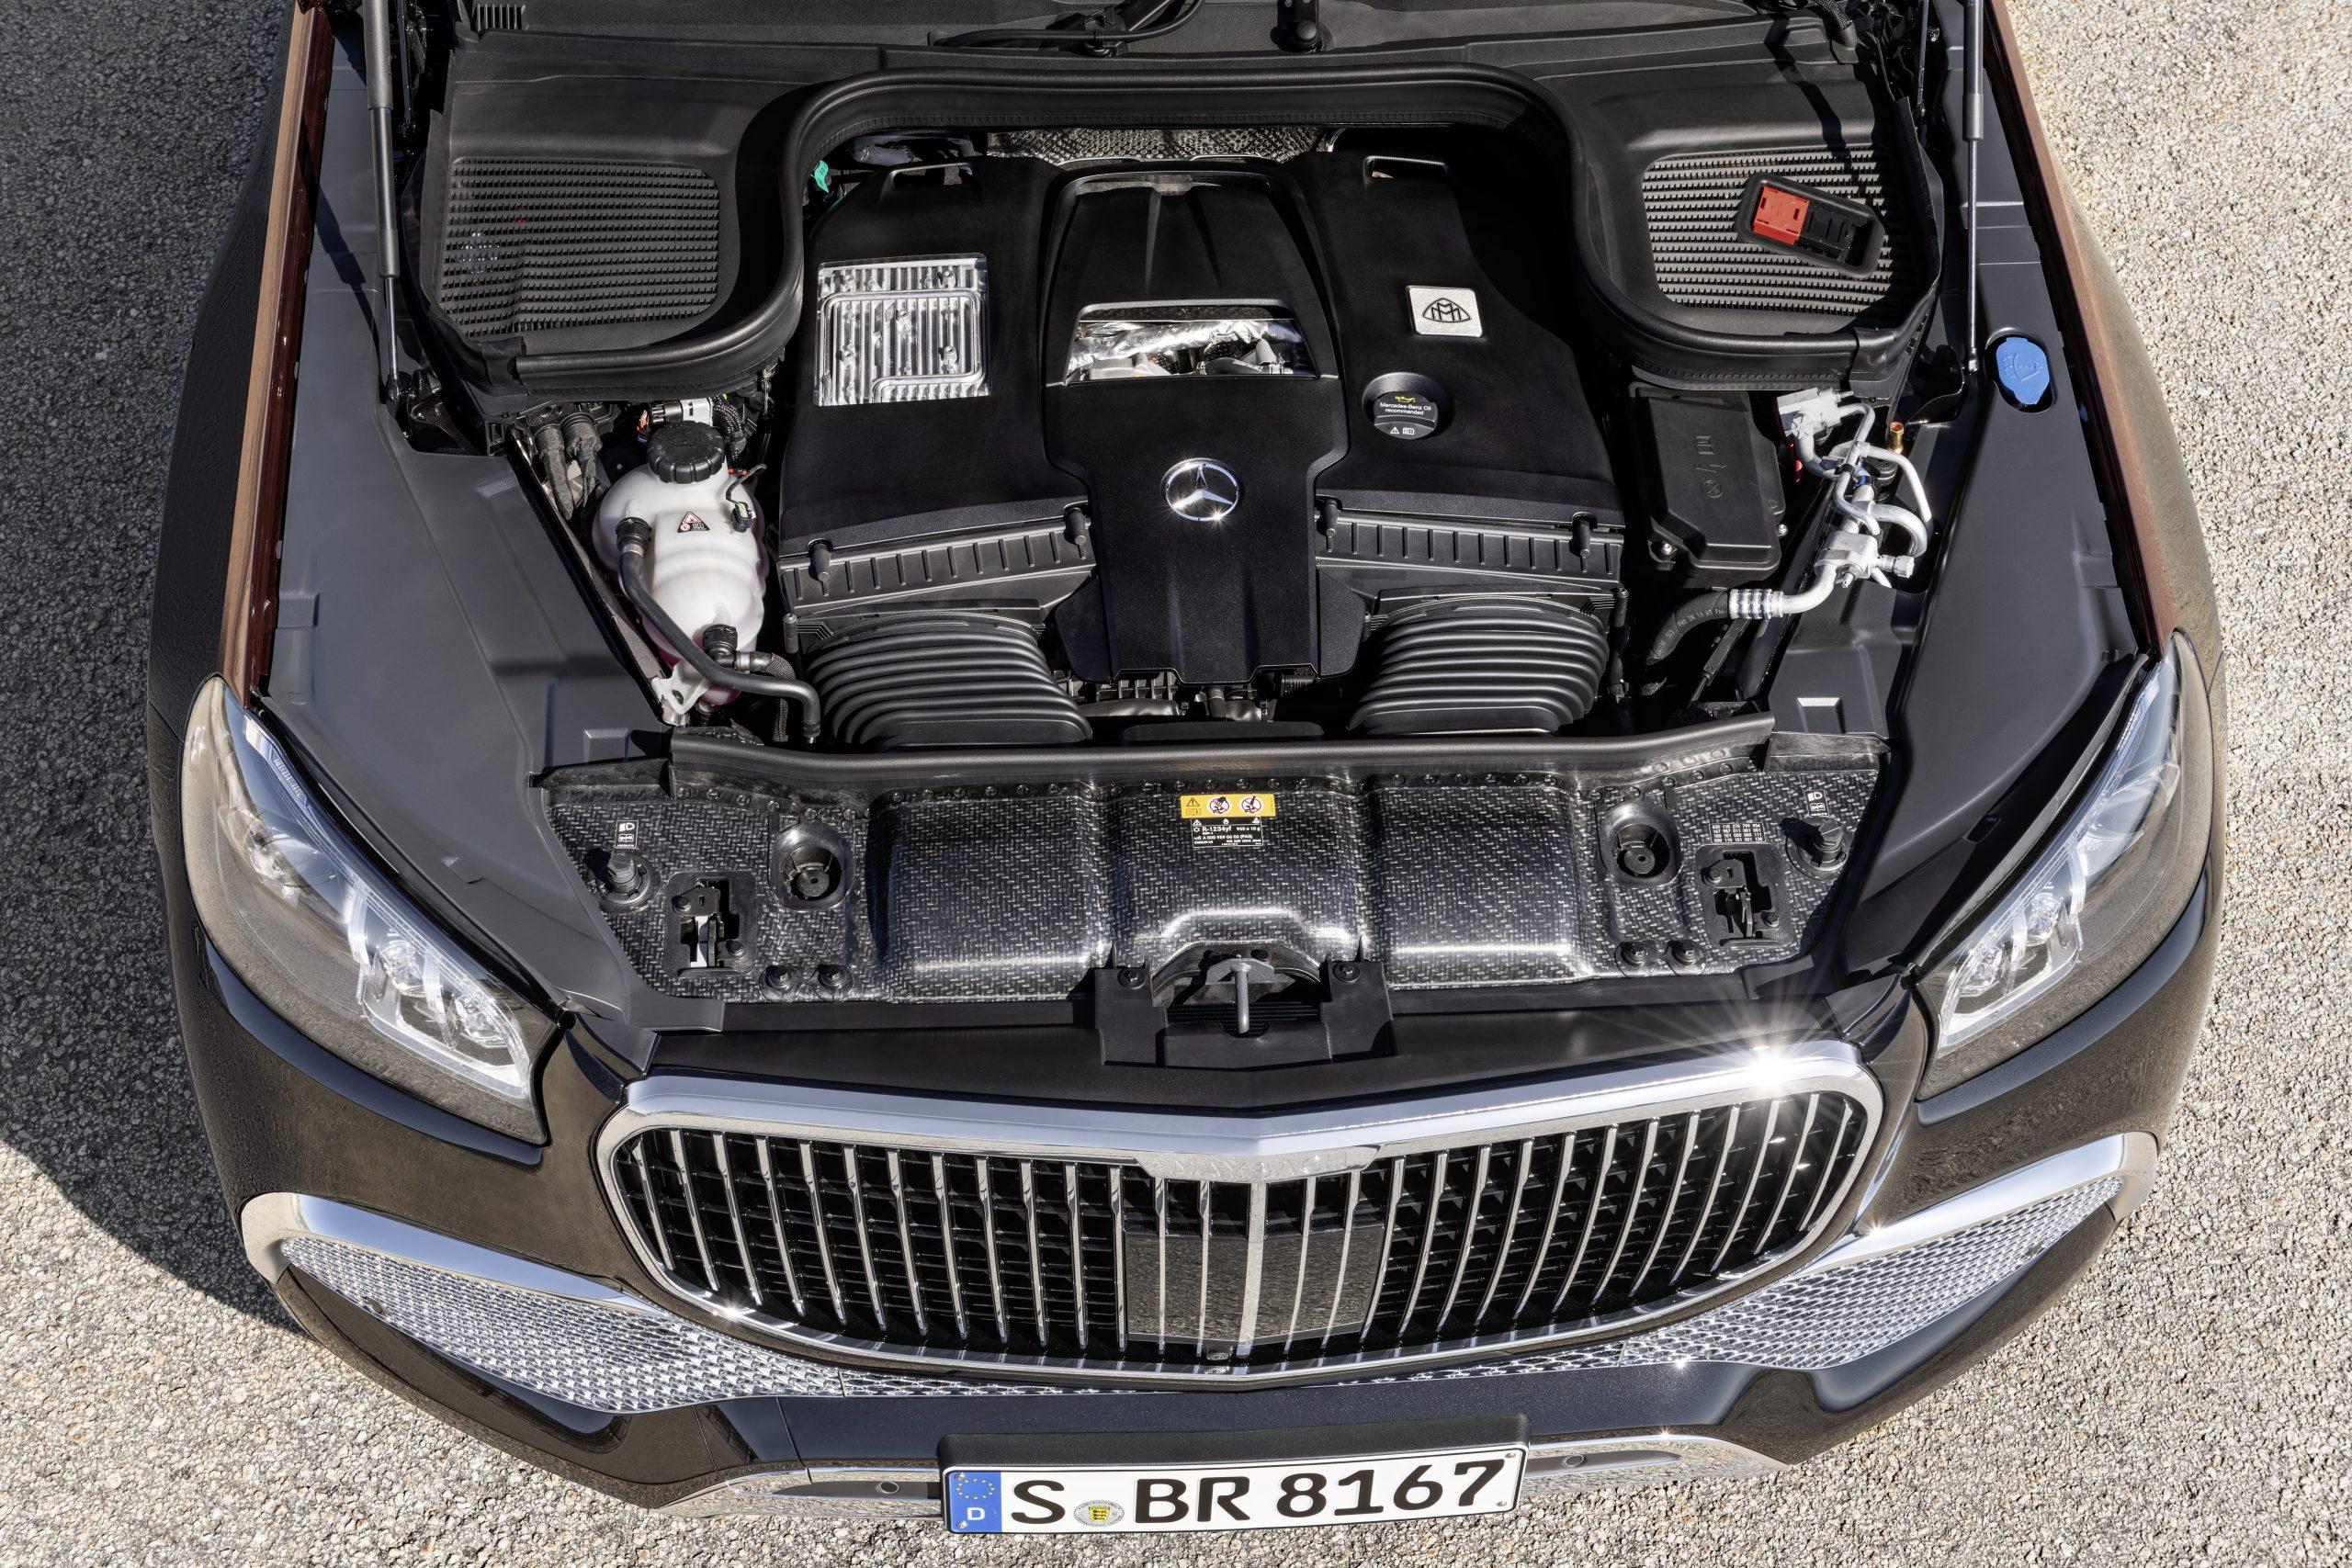 Mercedes-Maybach GLS 600 4MATIC Engine